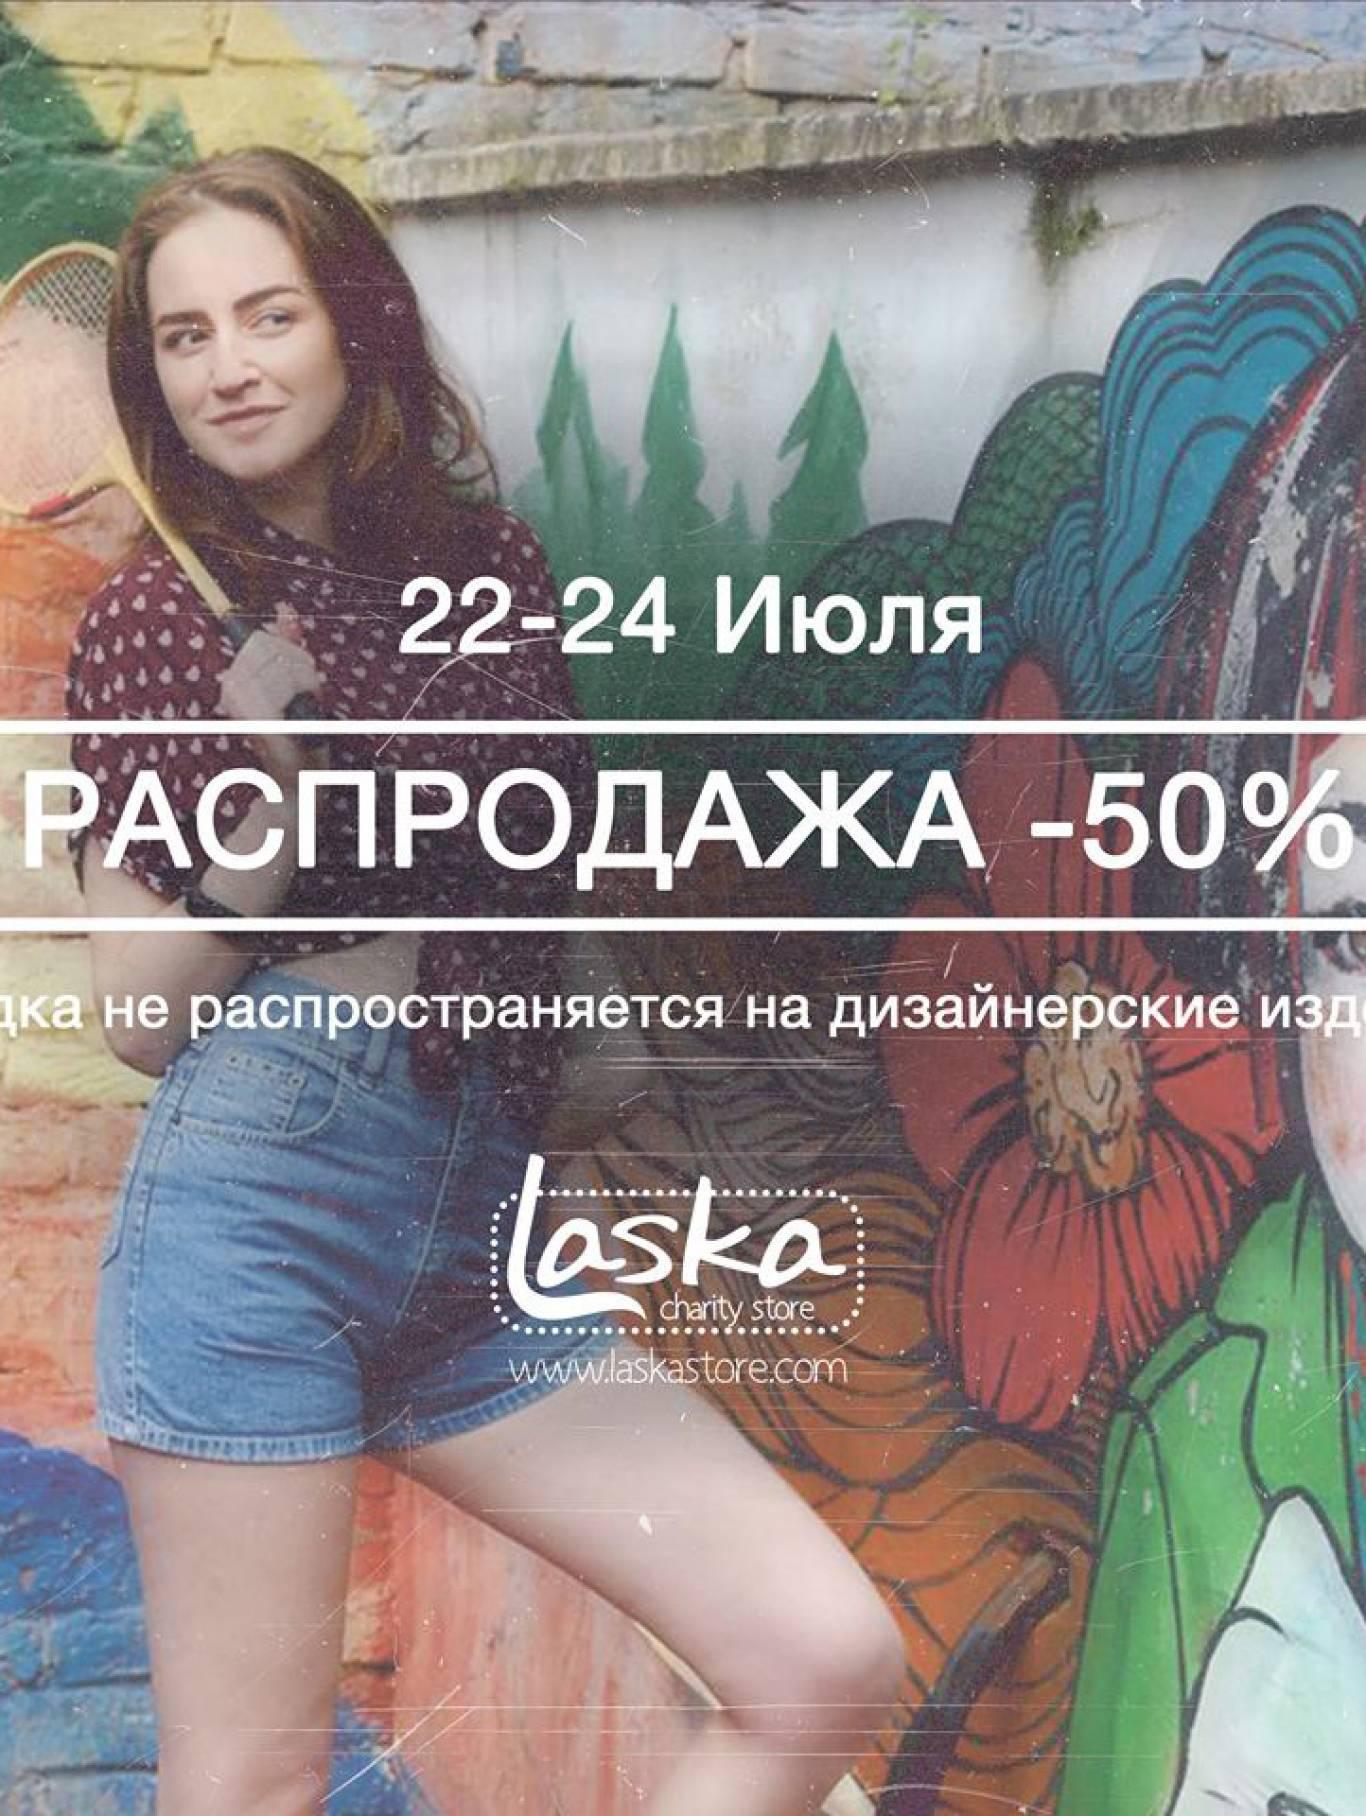 """Ласковая распродажа"" в магазине ""Ласка"""